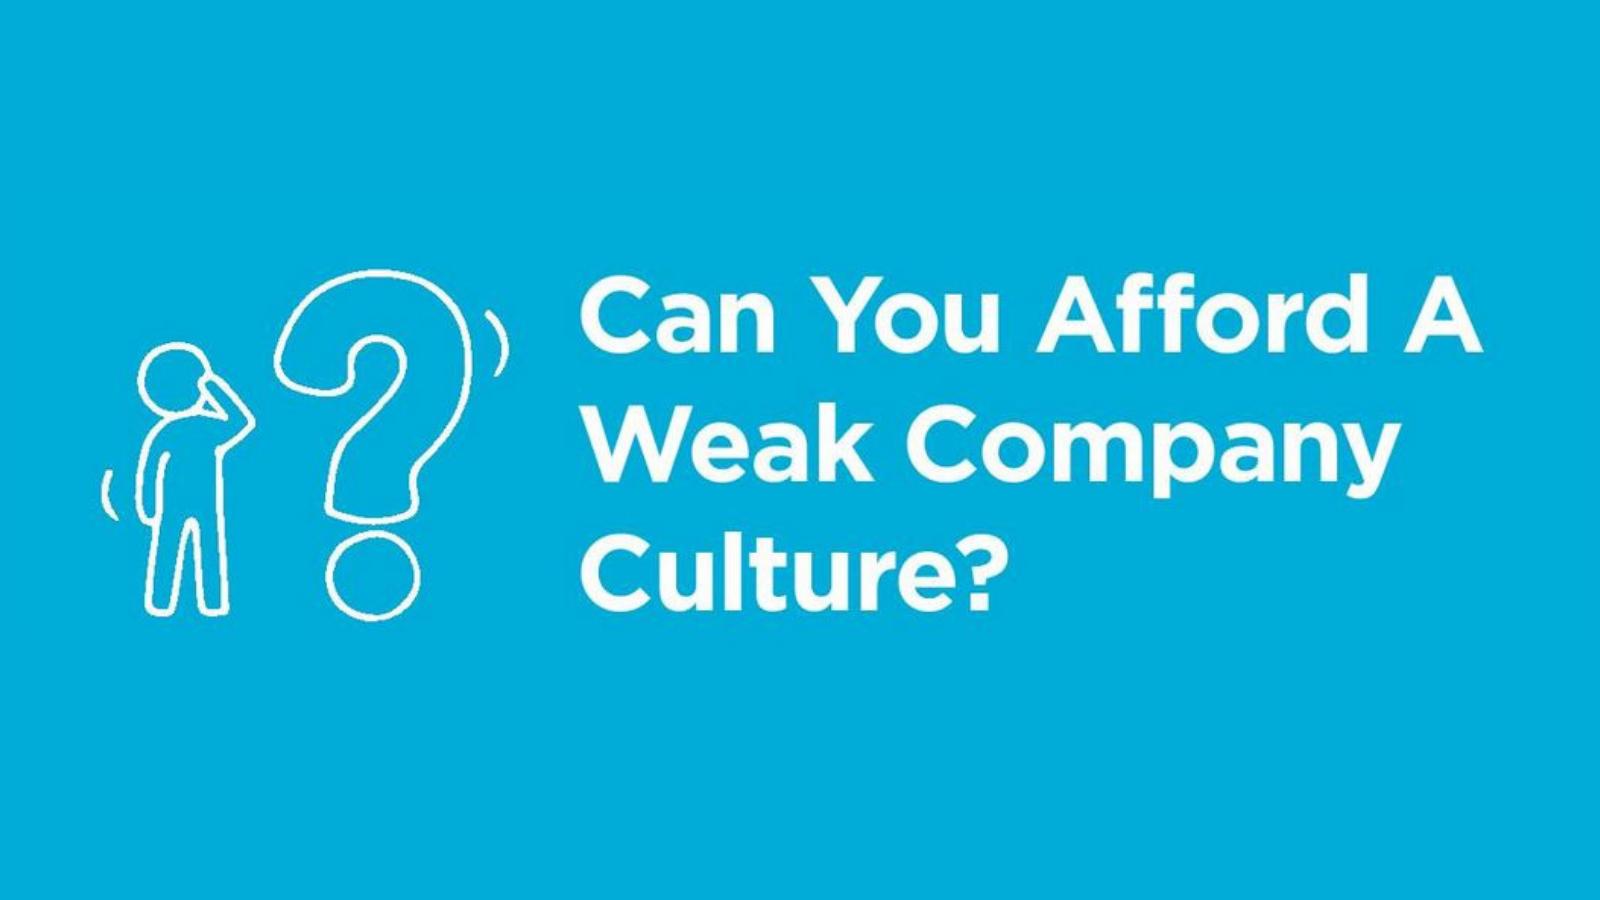 Can You Afford A Weak Company Culture?